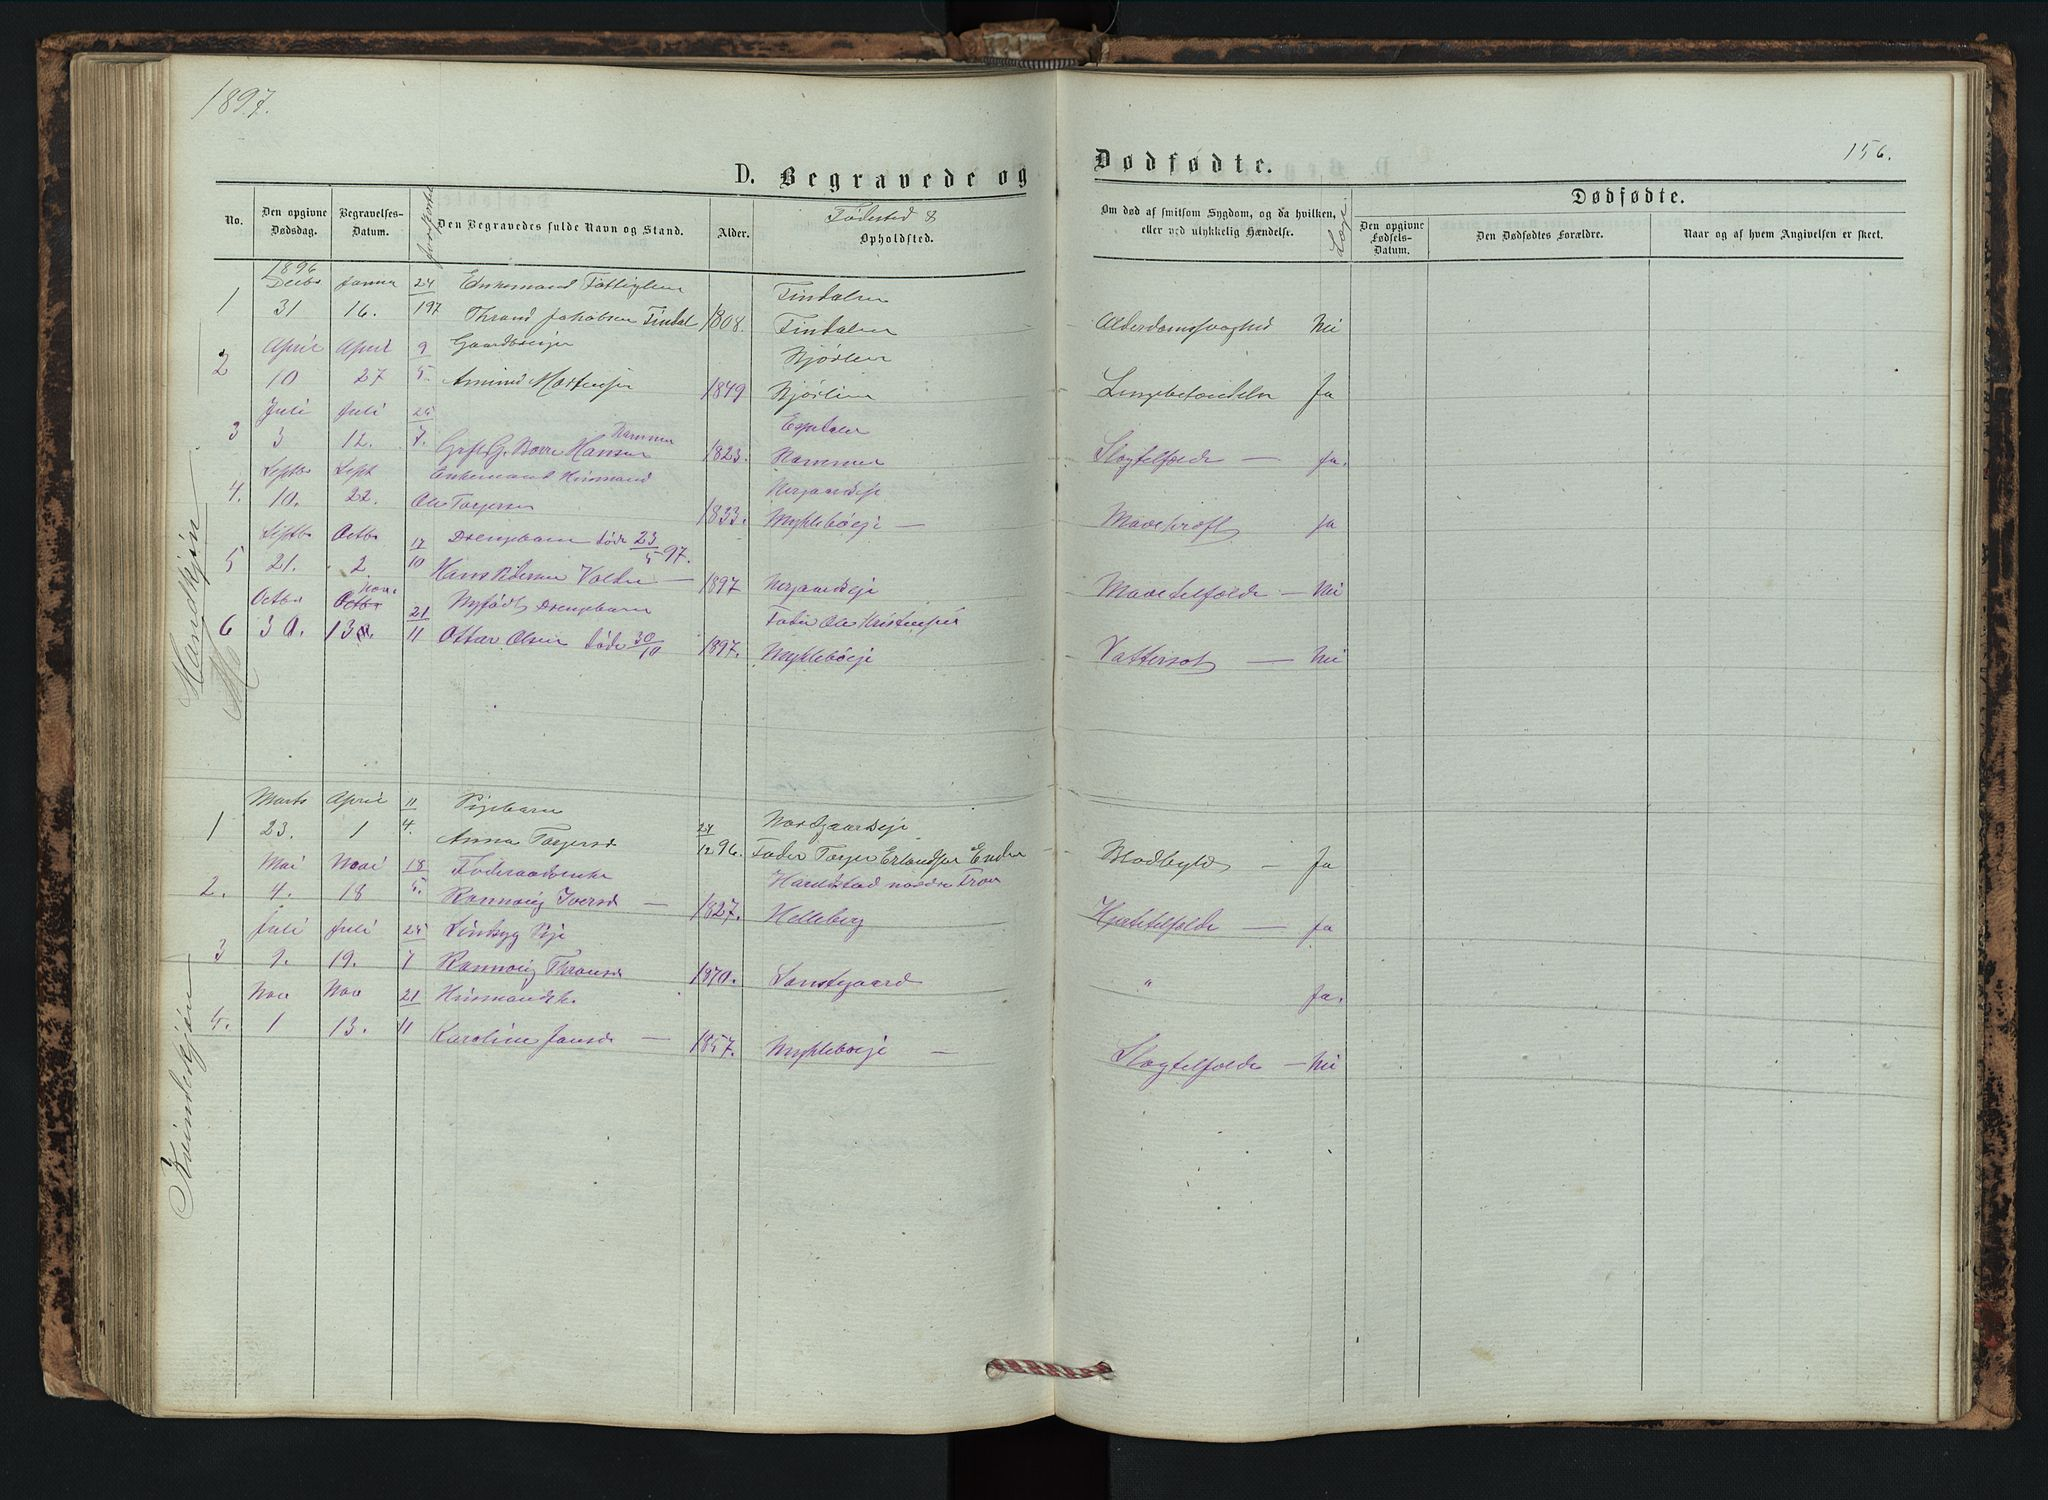 SAH, Vestre Gausdal prestekontor, Klokkerbok nr. 2, 1874-1897, s. 156